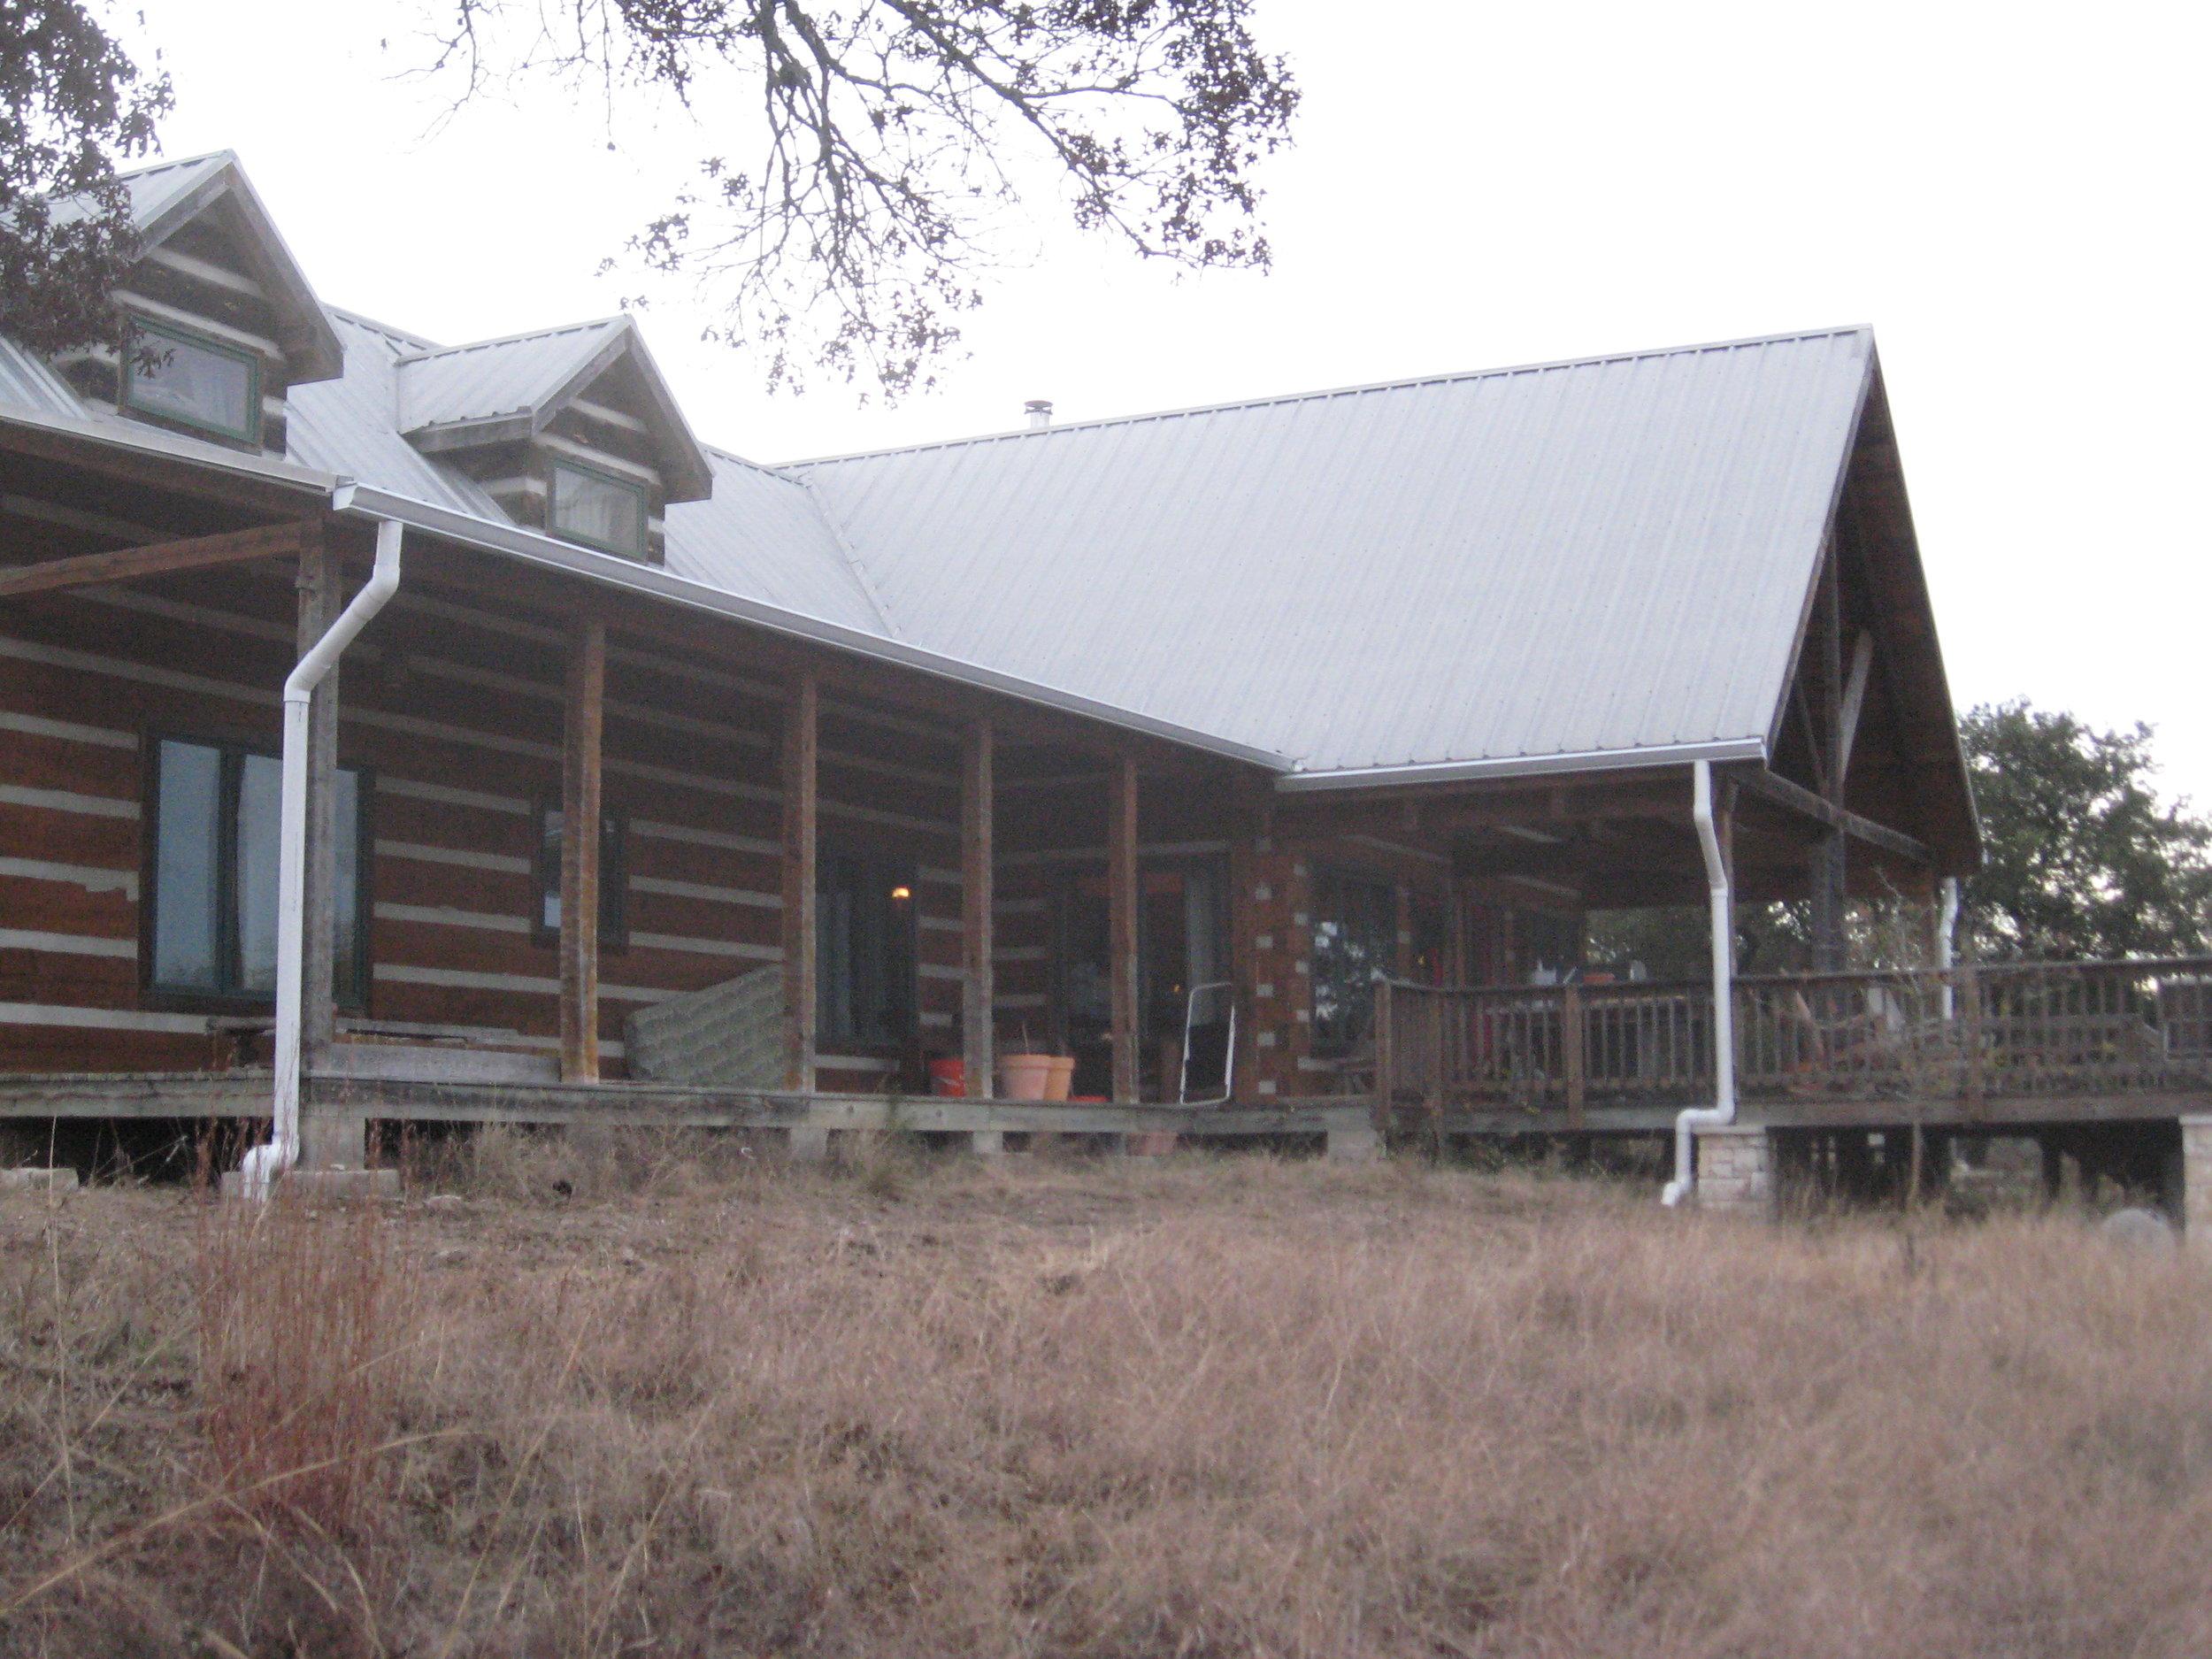 02-House View.JPG